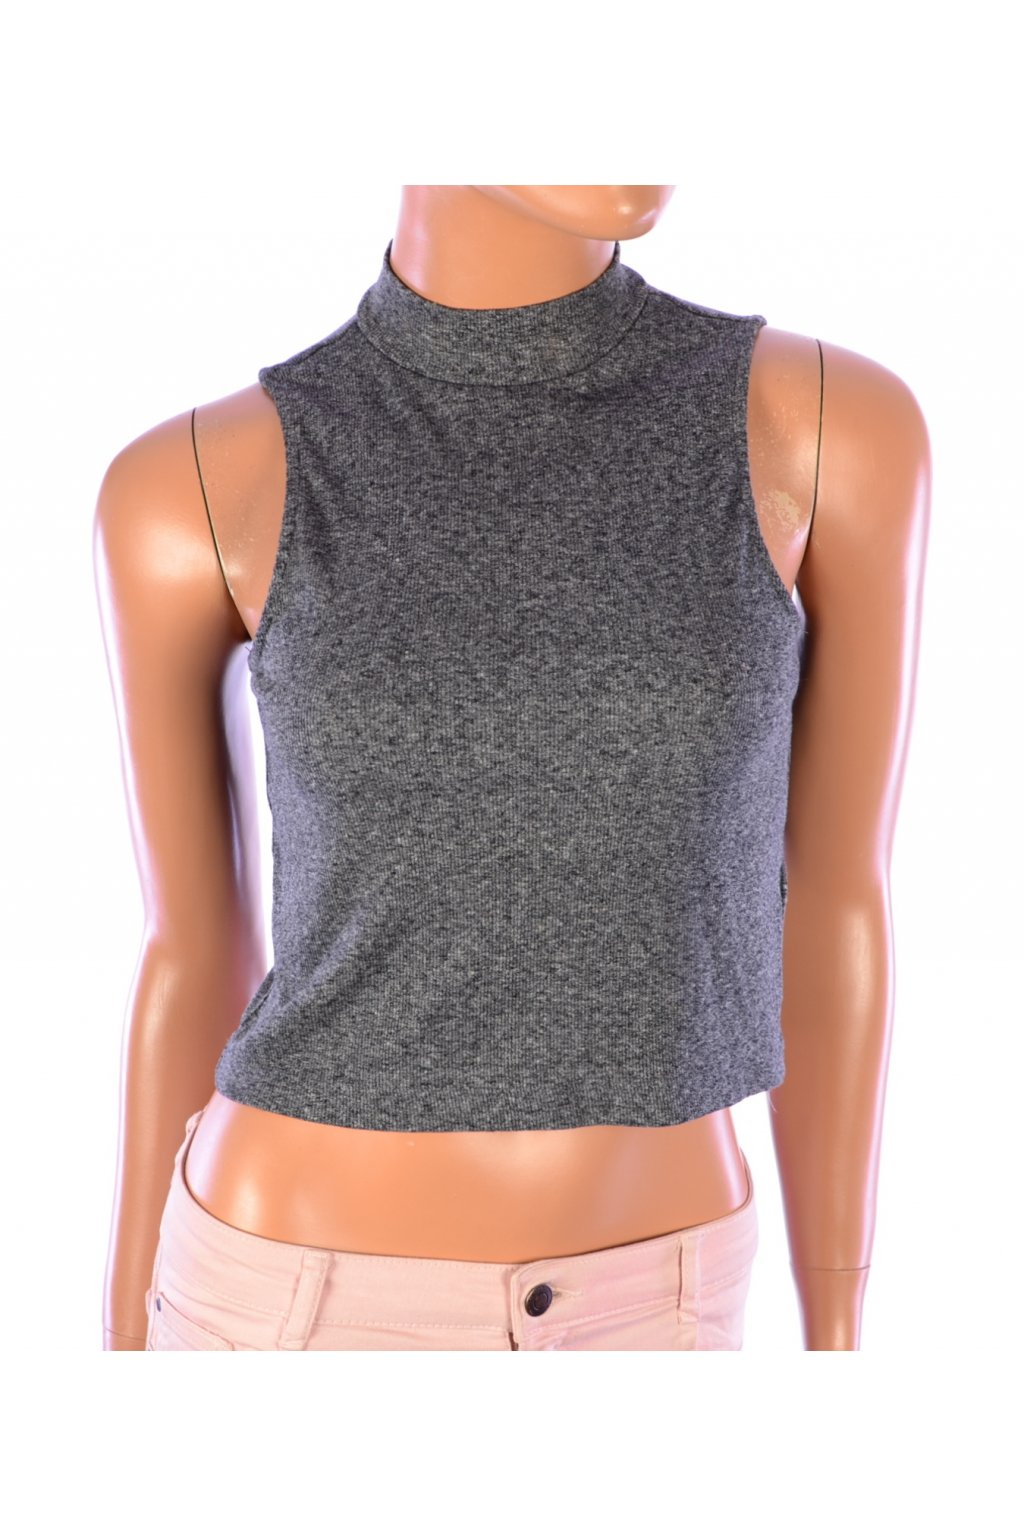 Tričko crop top šedé H&M vel. M